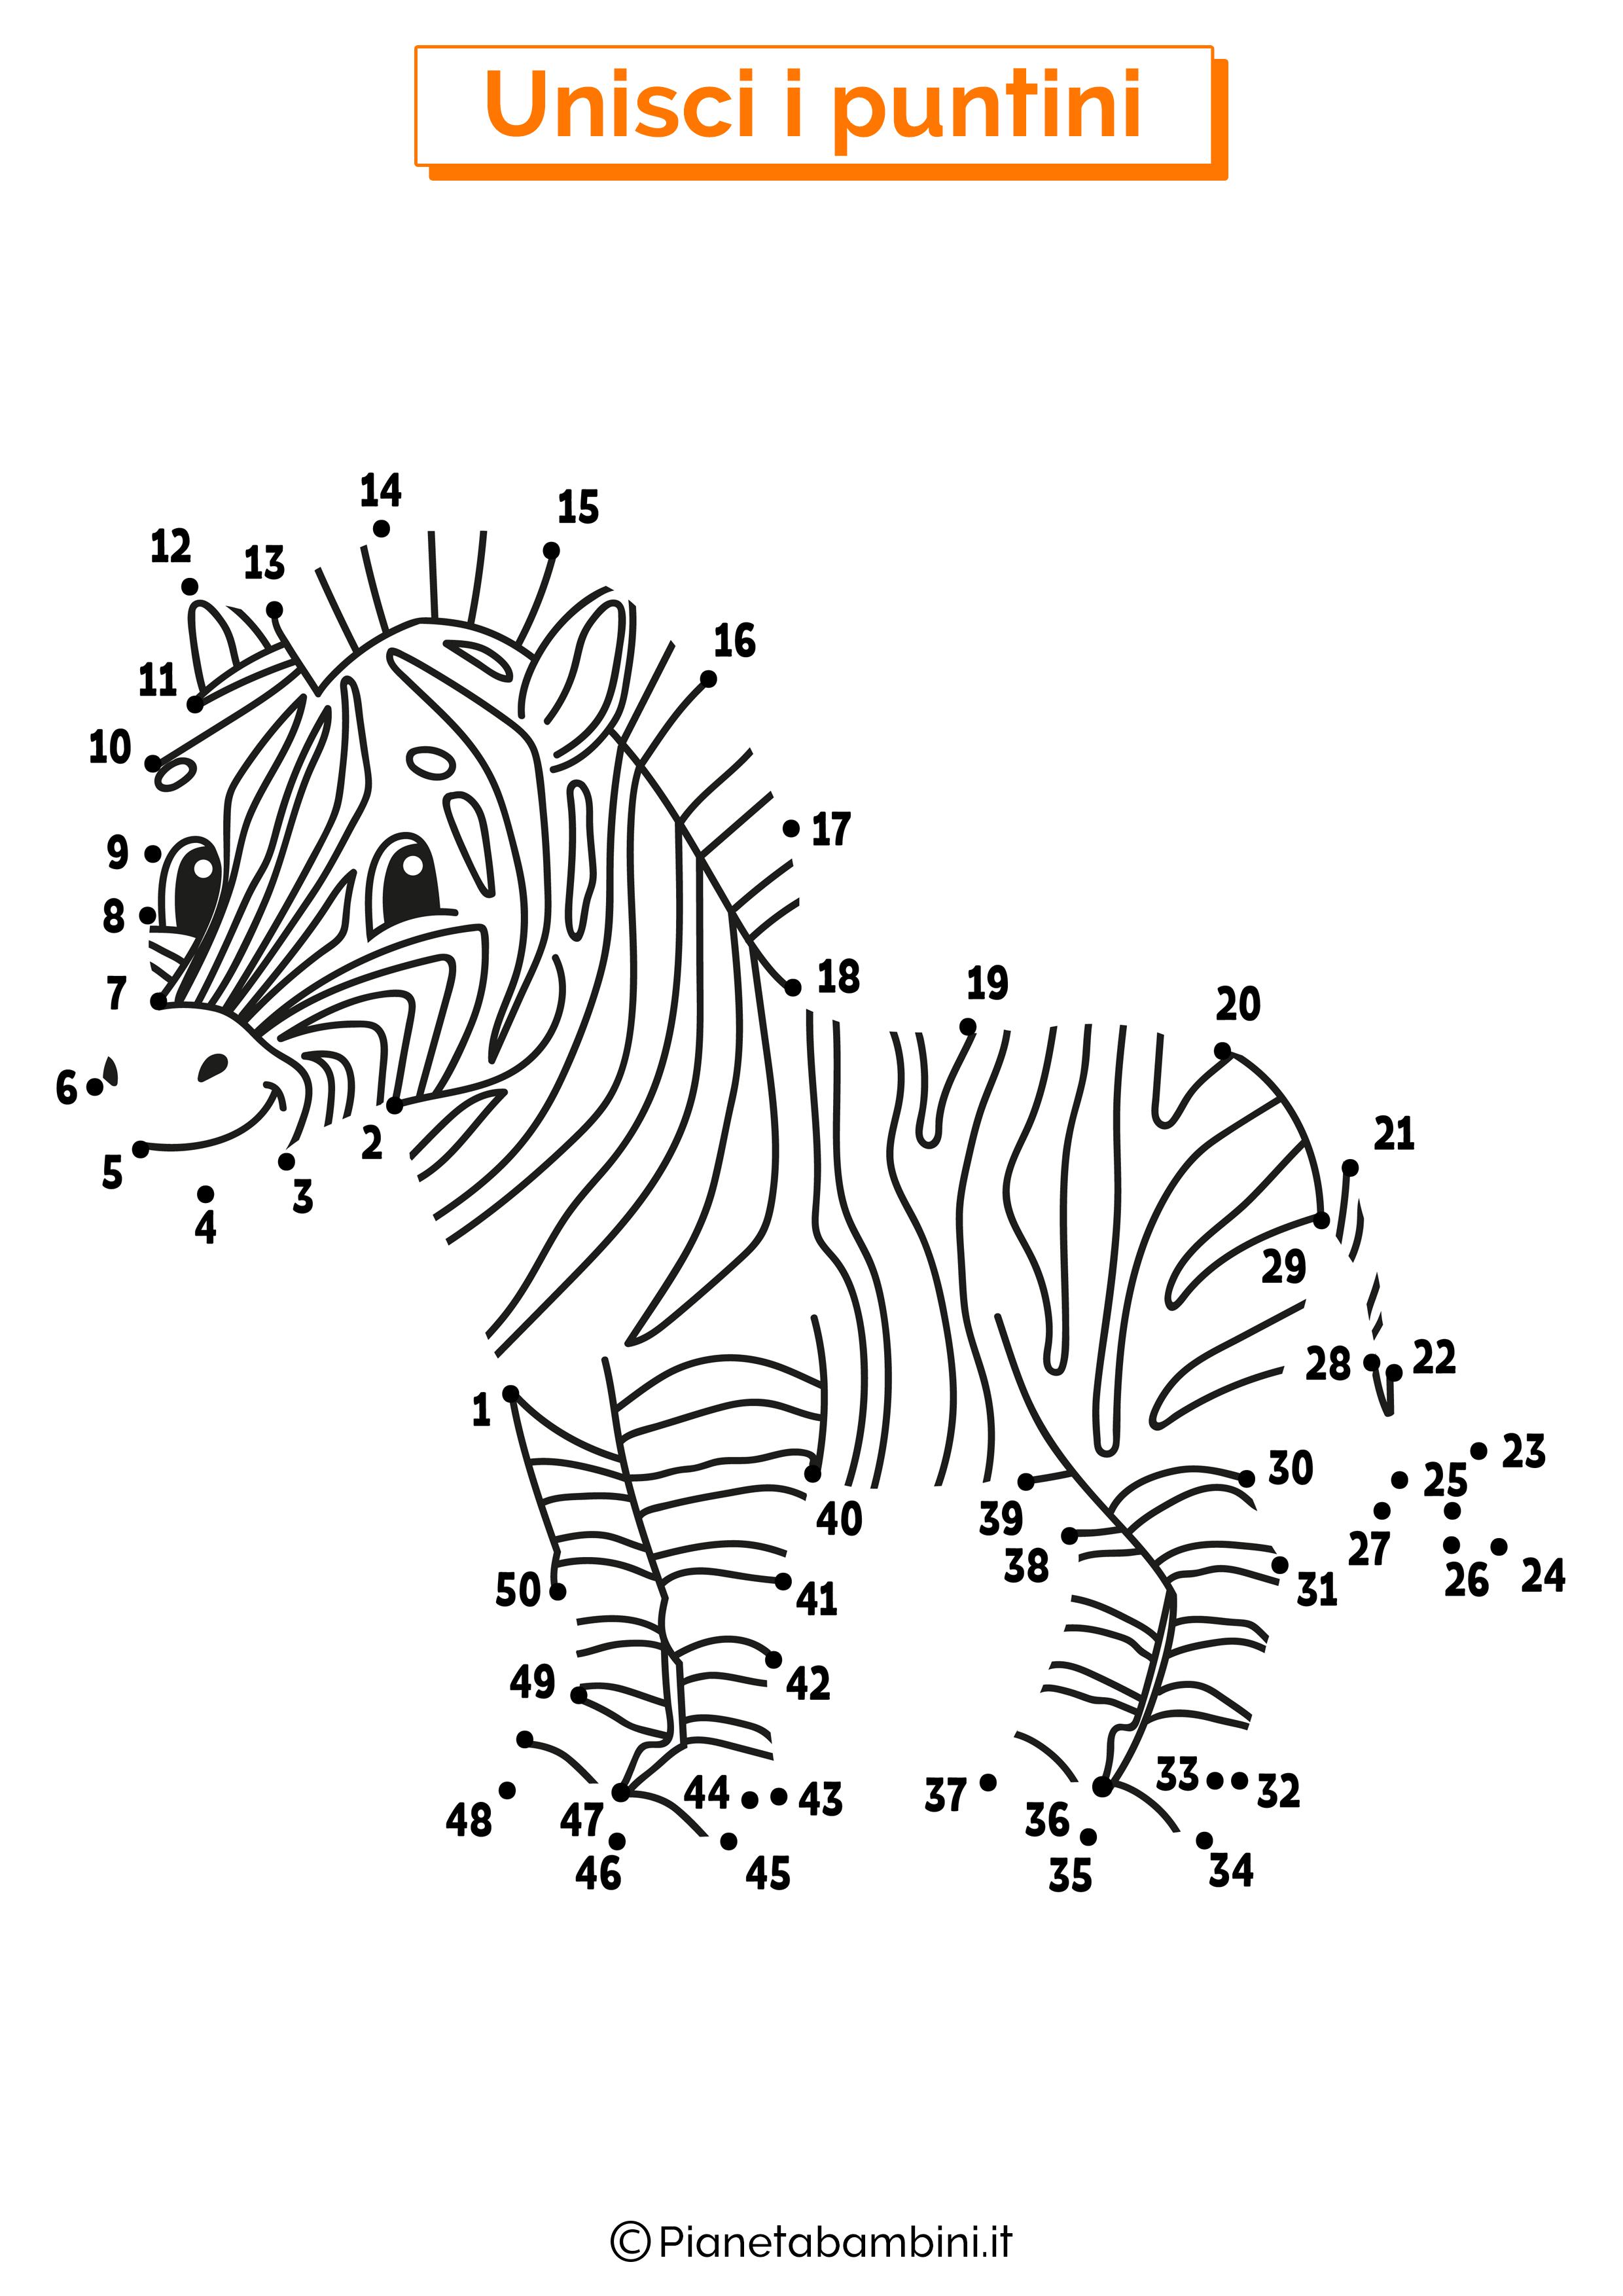 Disegno unisci i puntini da 1 a 50 zebra